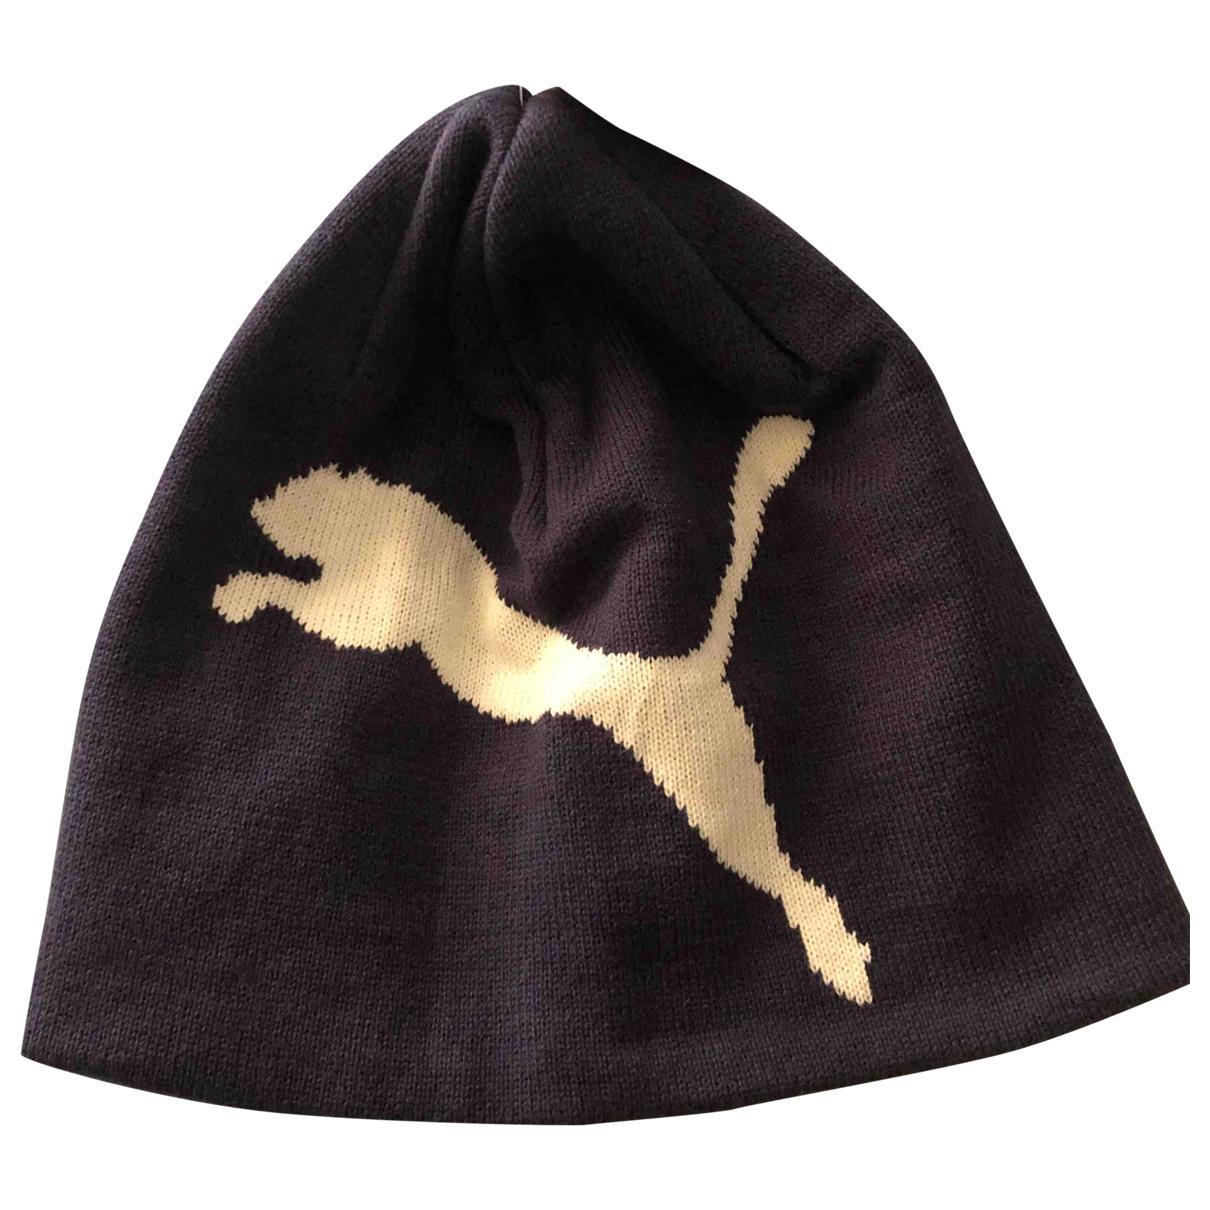 Puma \N Blue Wool hat & pull on hat for Men M International